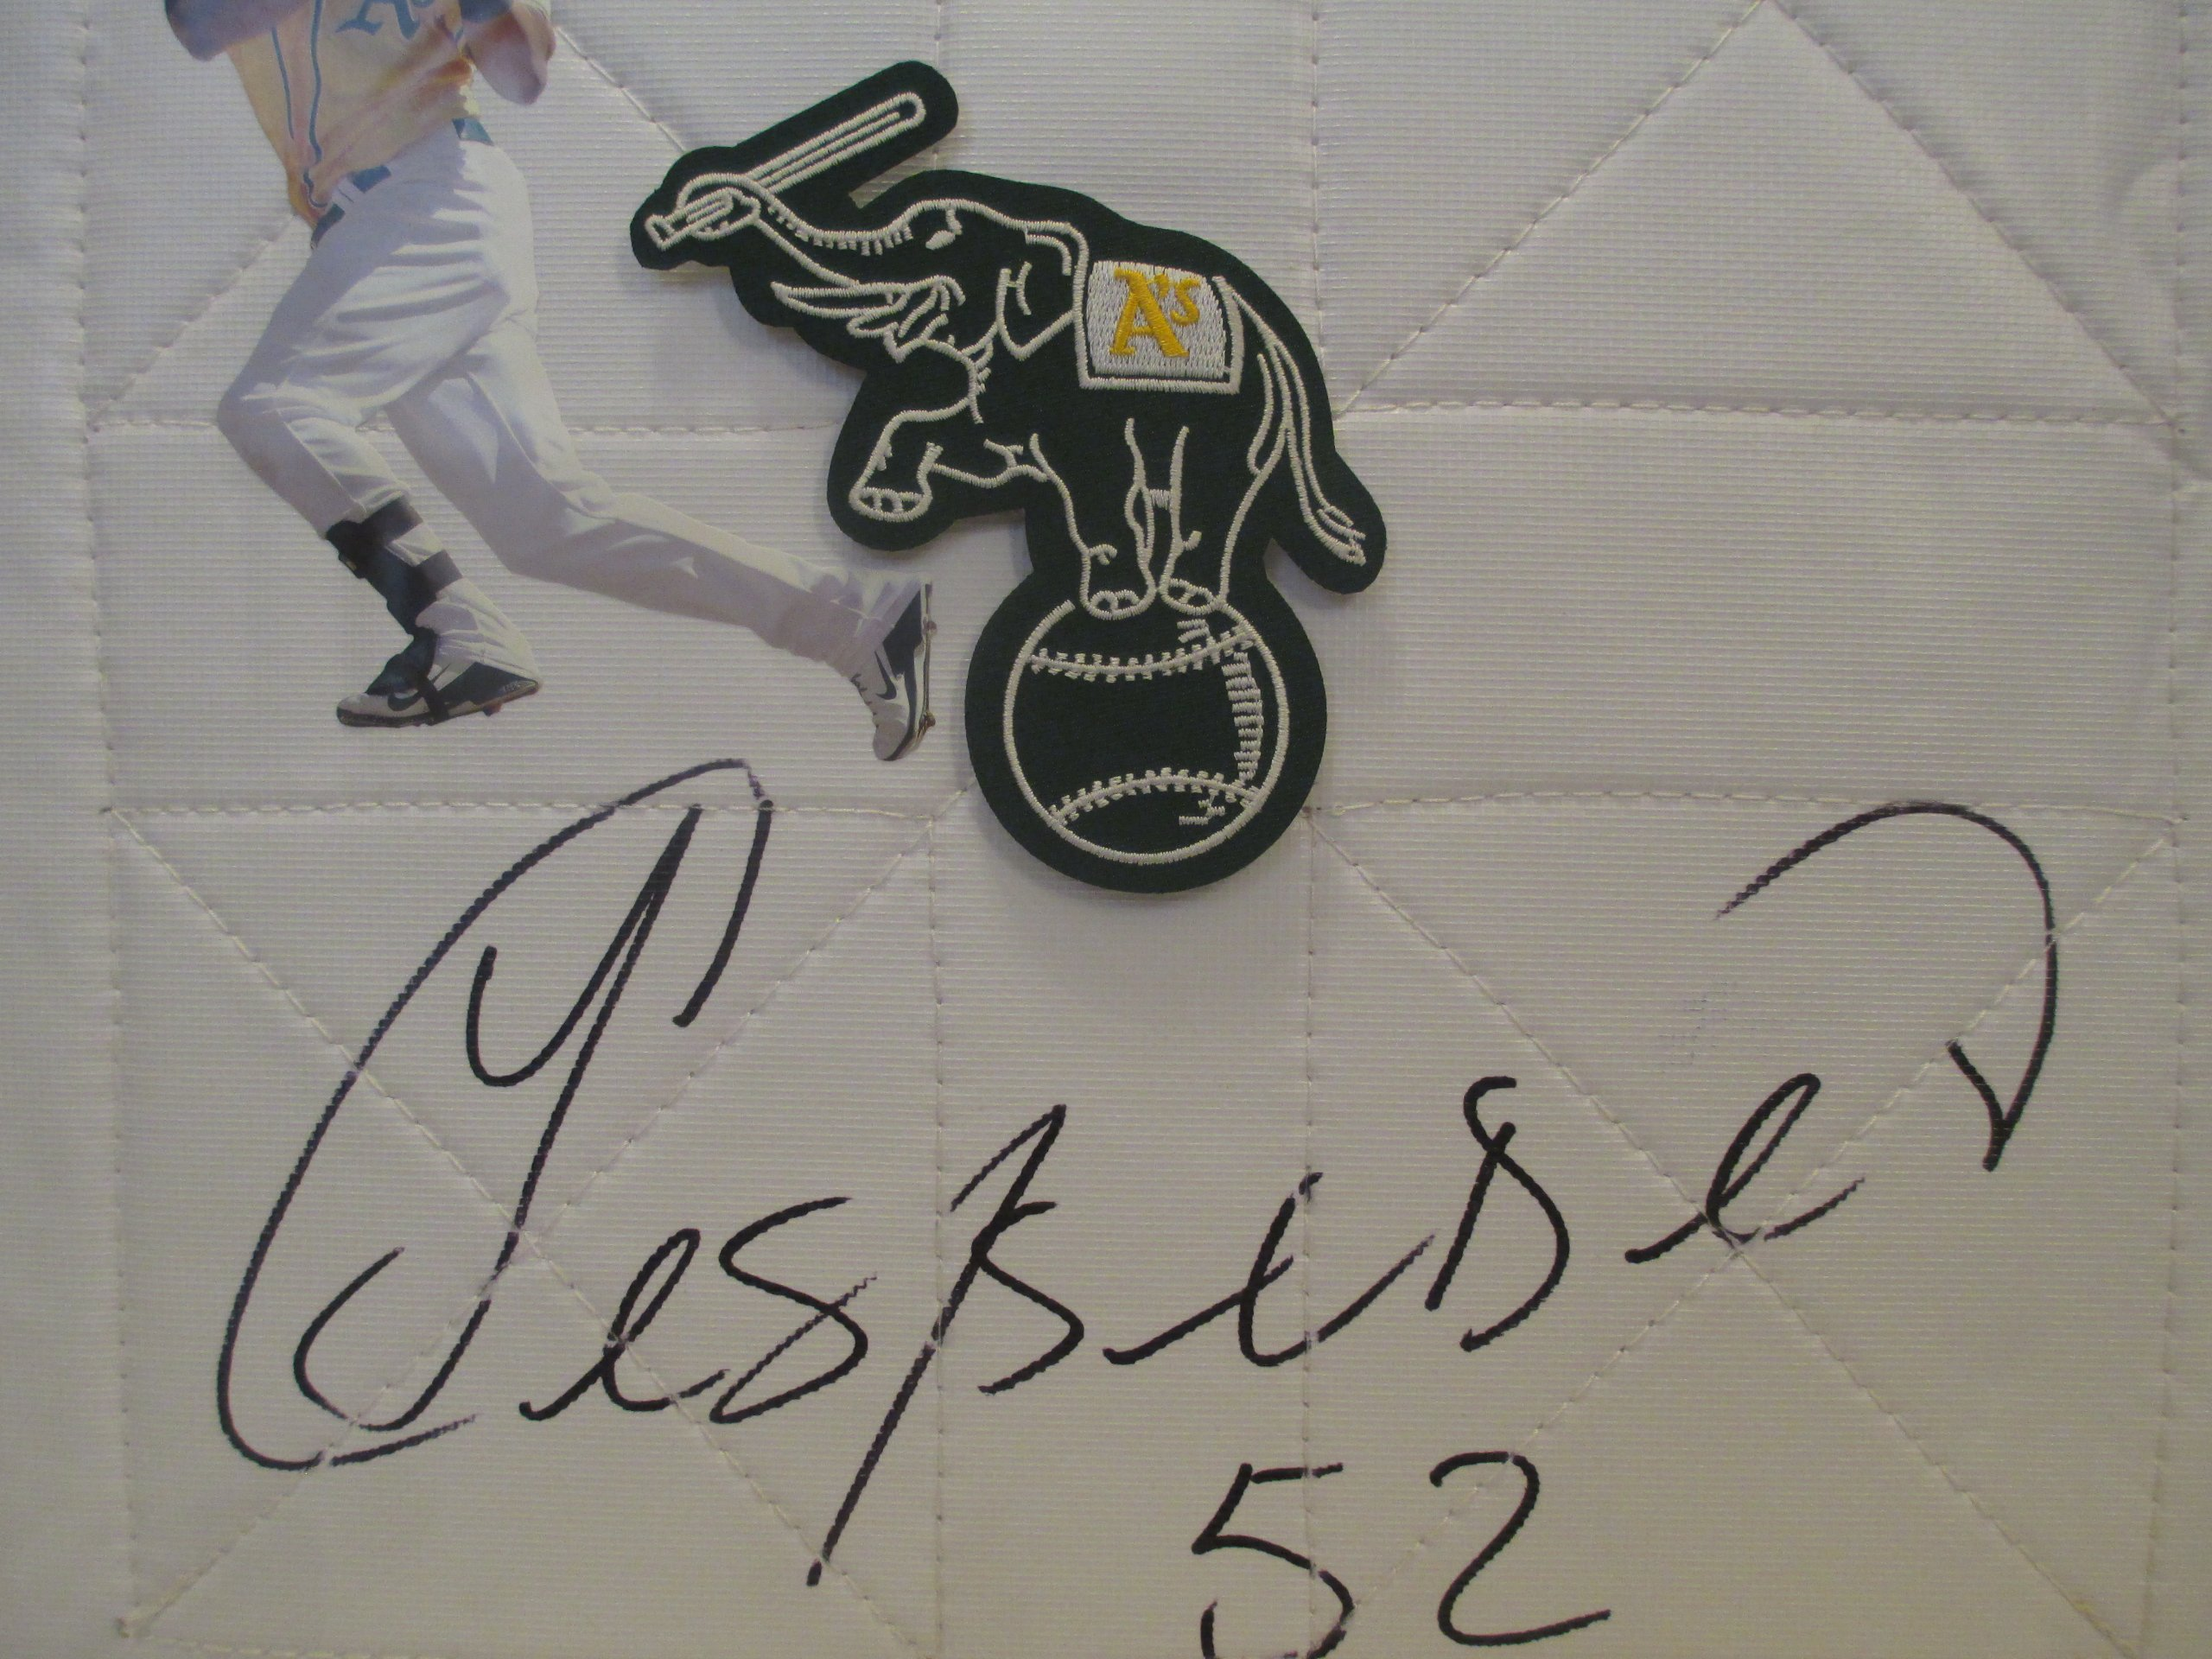 "Oakland Athletics Yoenis Cespedes Autographed Hand Signed Oakland A""s Elephant Baseball Photo Full Size Base with Proof Photo of Signing and COA"